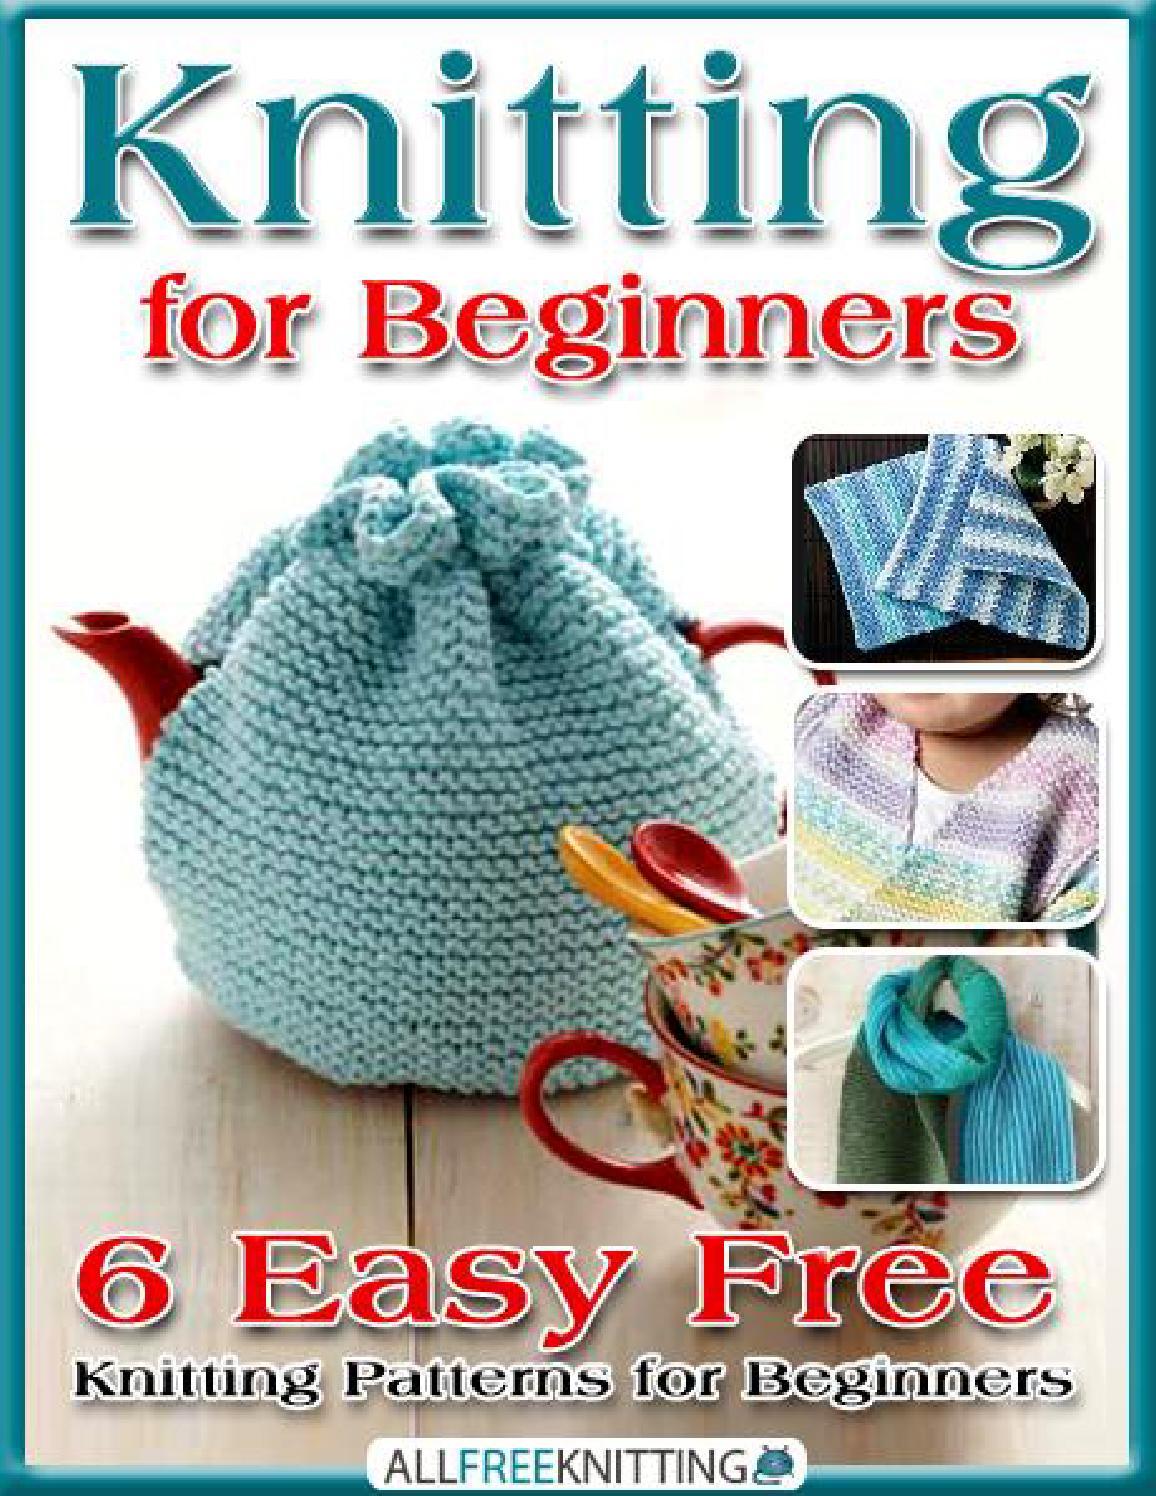 Knitting Book For Beginners : Knitting for beginners easy free patterns